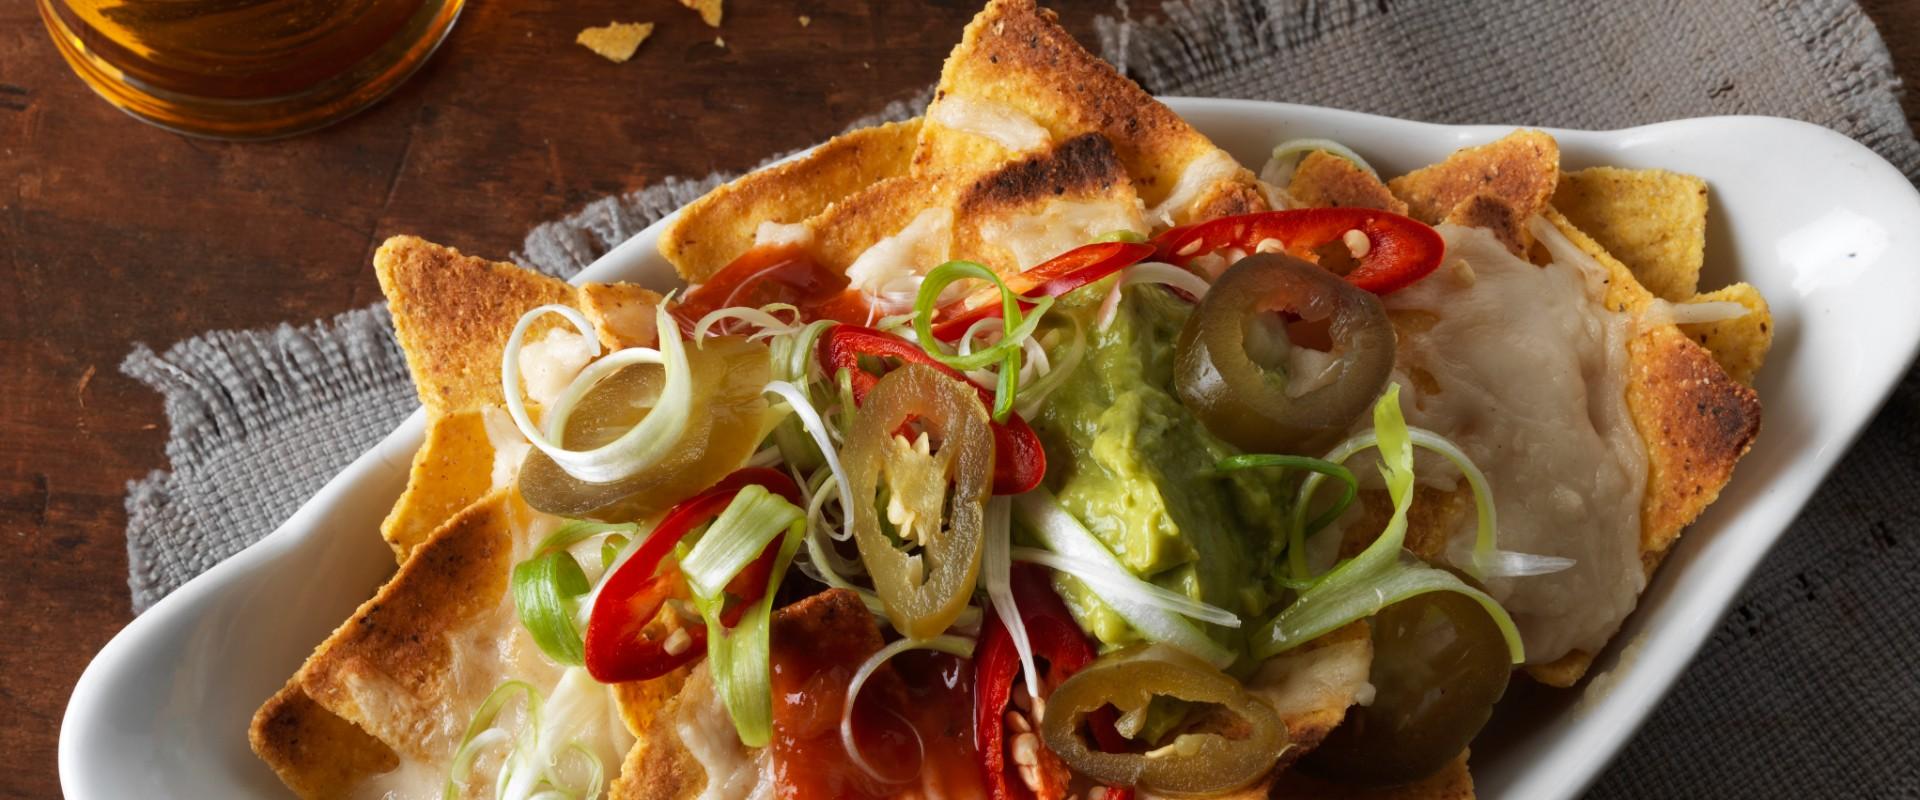 vegan nachos and beer joseph holt